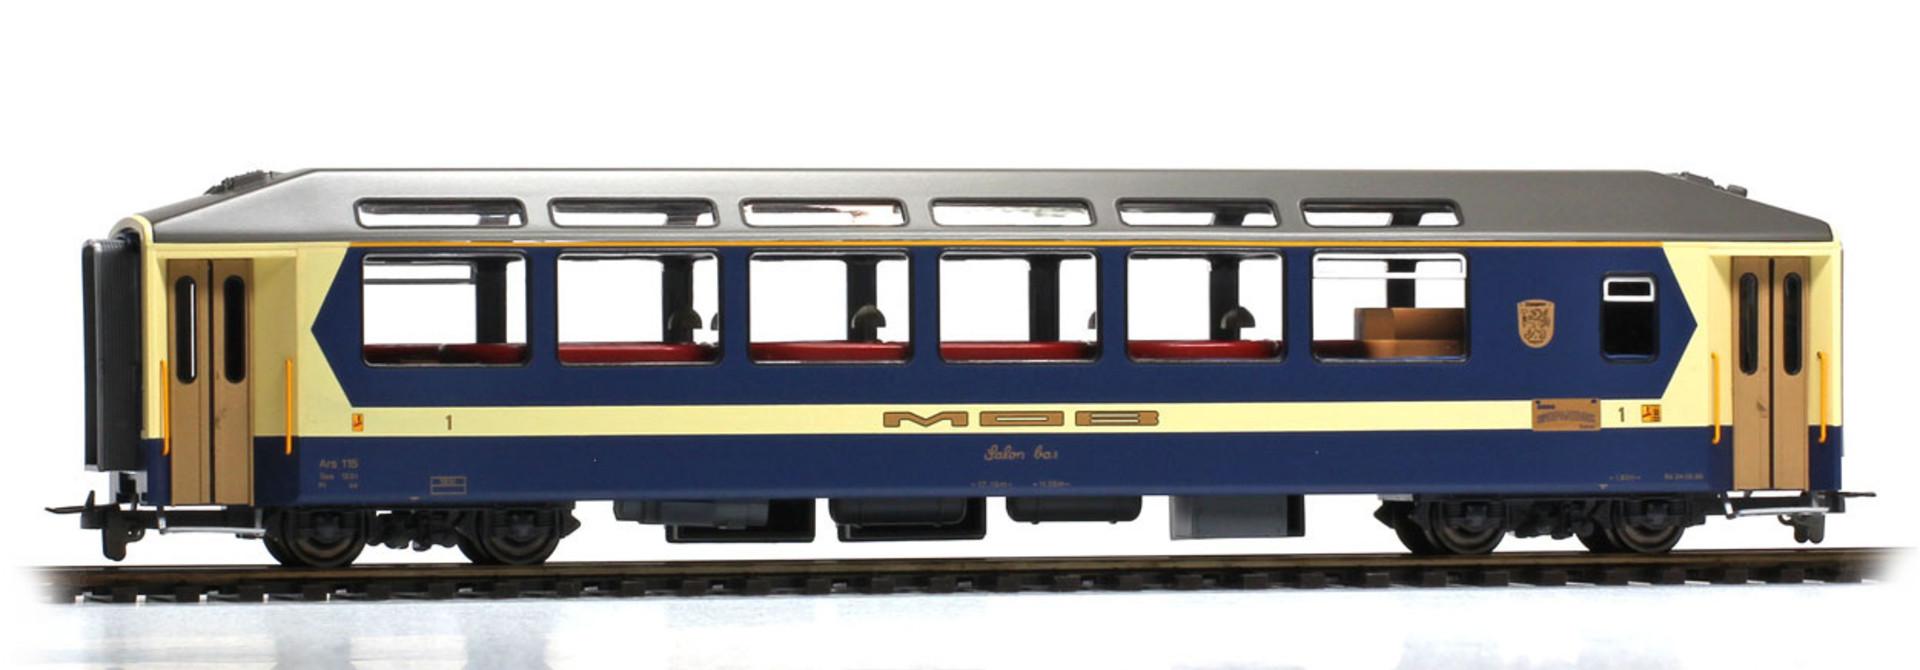 3295305 MOB Ars 115 Panoramawagen Salon-Bar